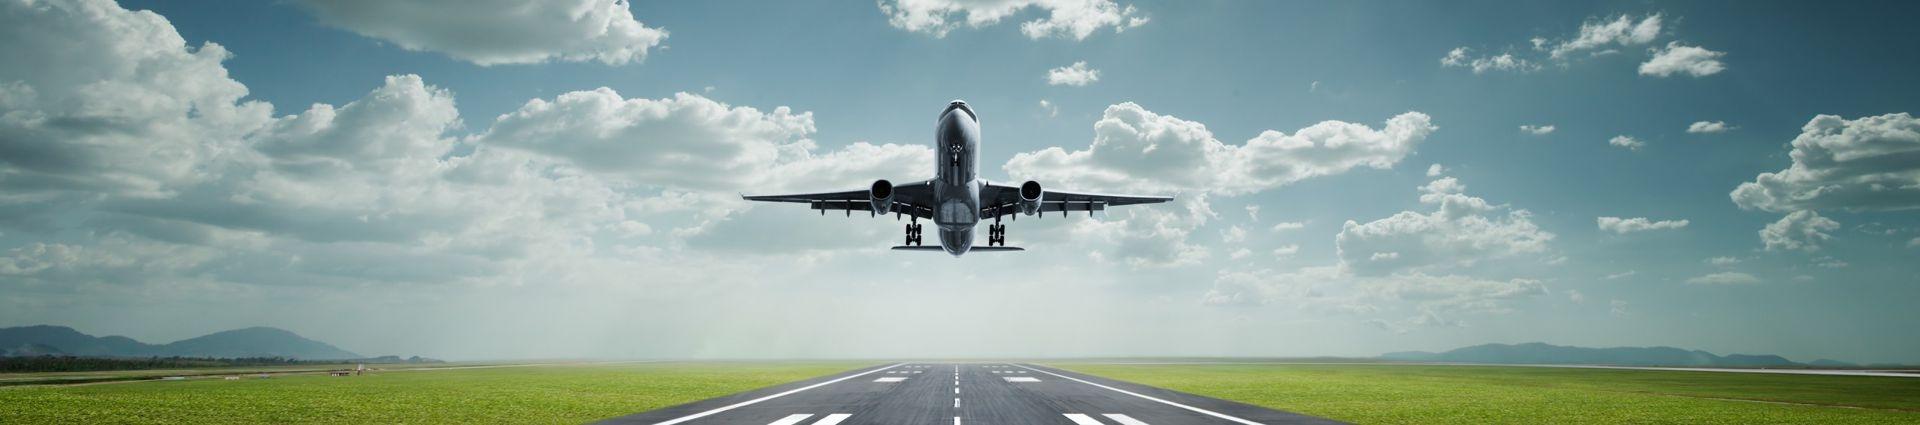 vuelos-avion